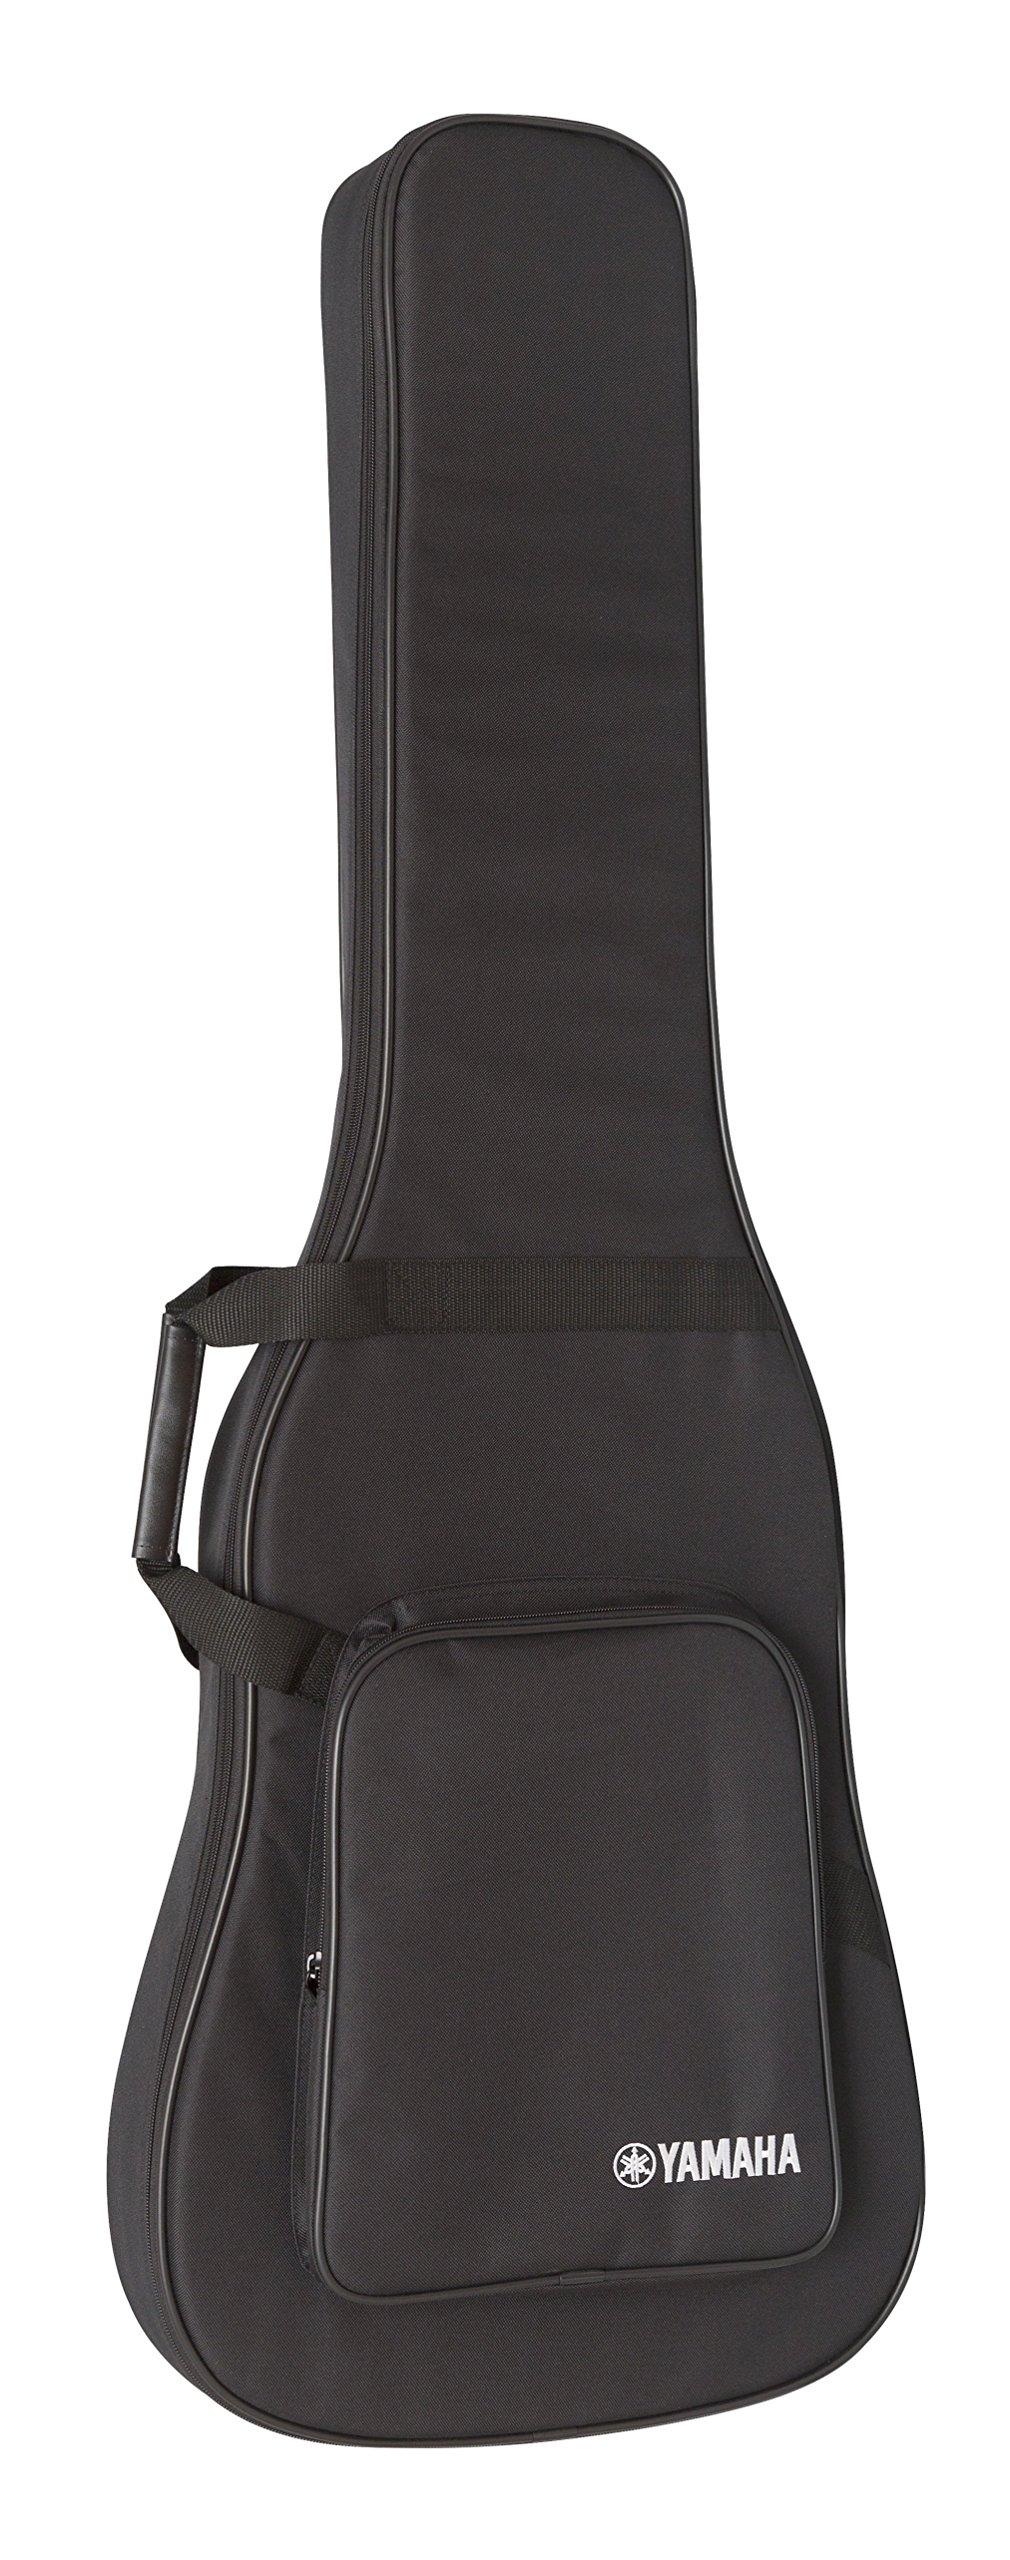 Yamaha EB-SC Soft Lightweight Electric Bass Guitar Case